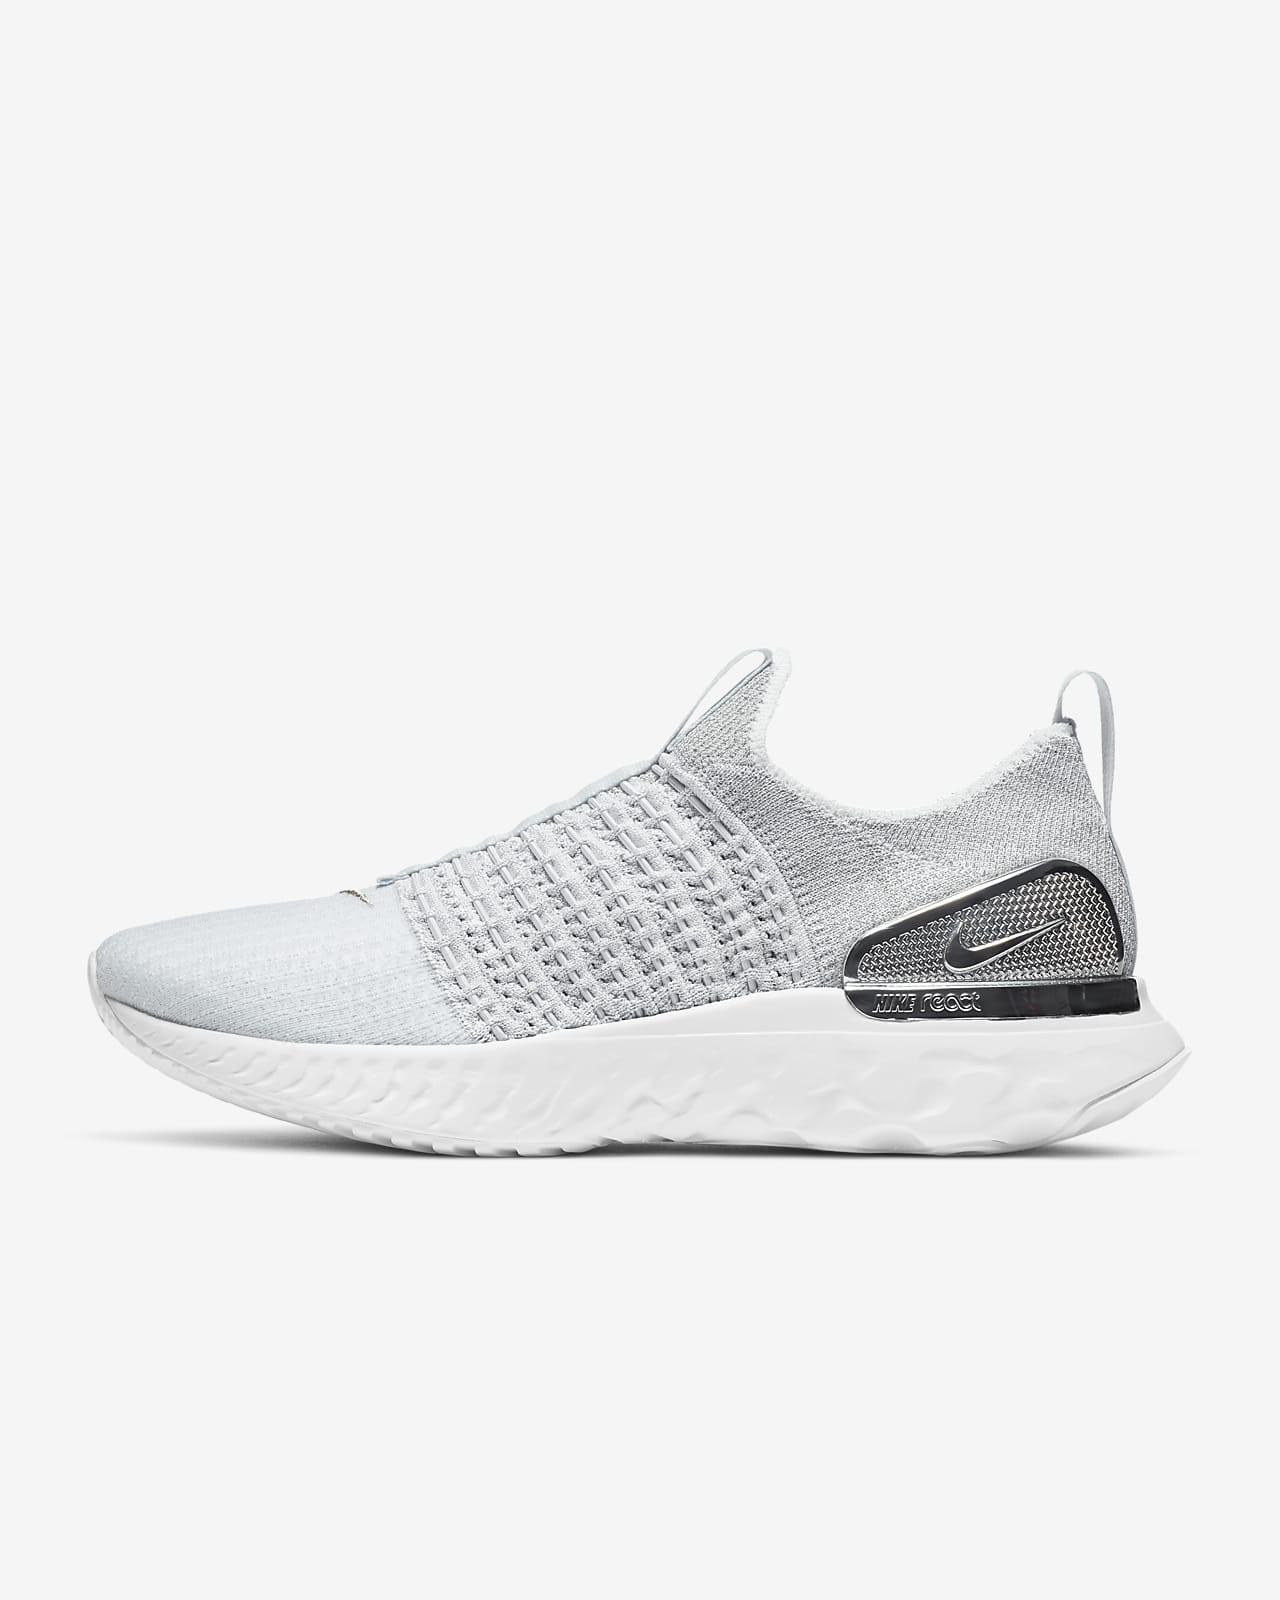 Nike React Phantom Run Flyknit 2 Premium Women's Running Shoe